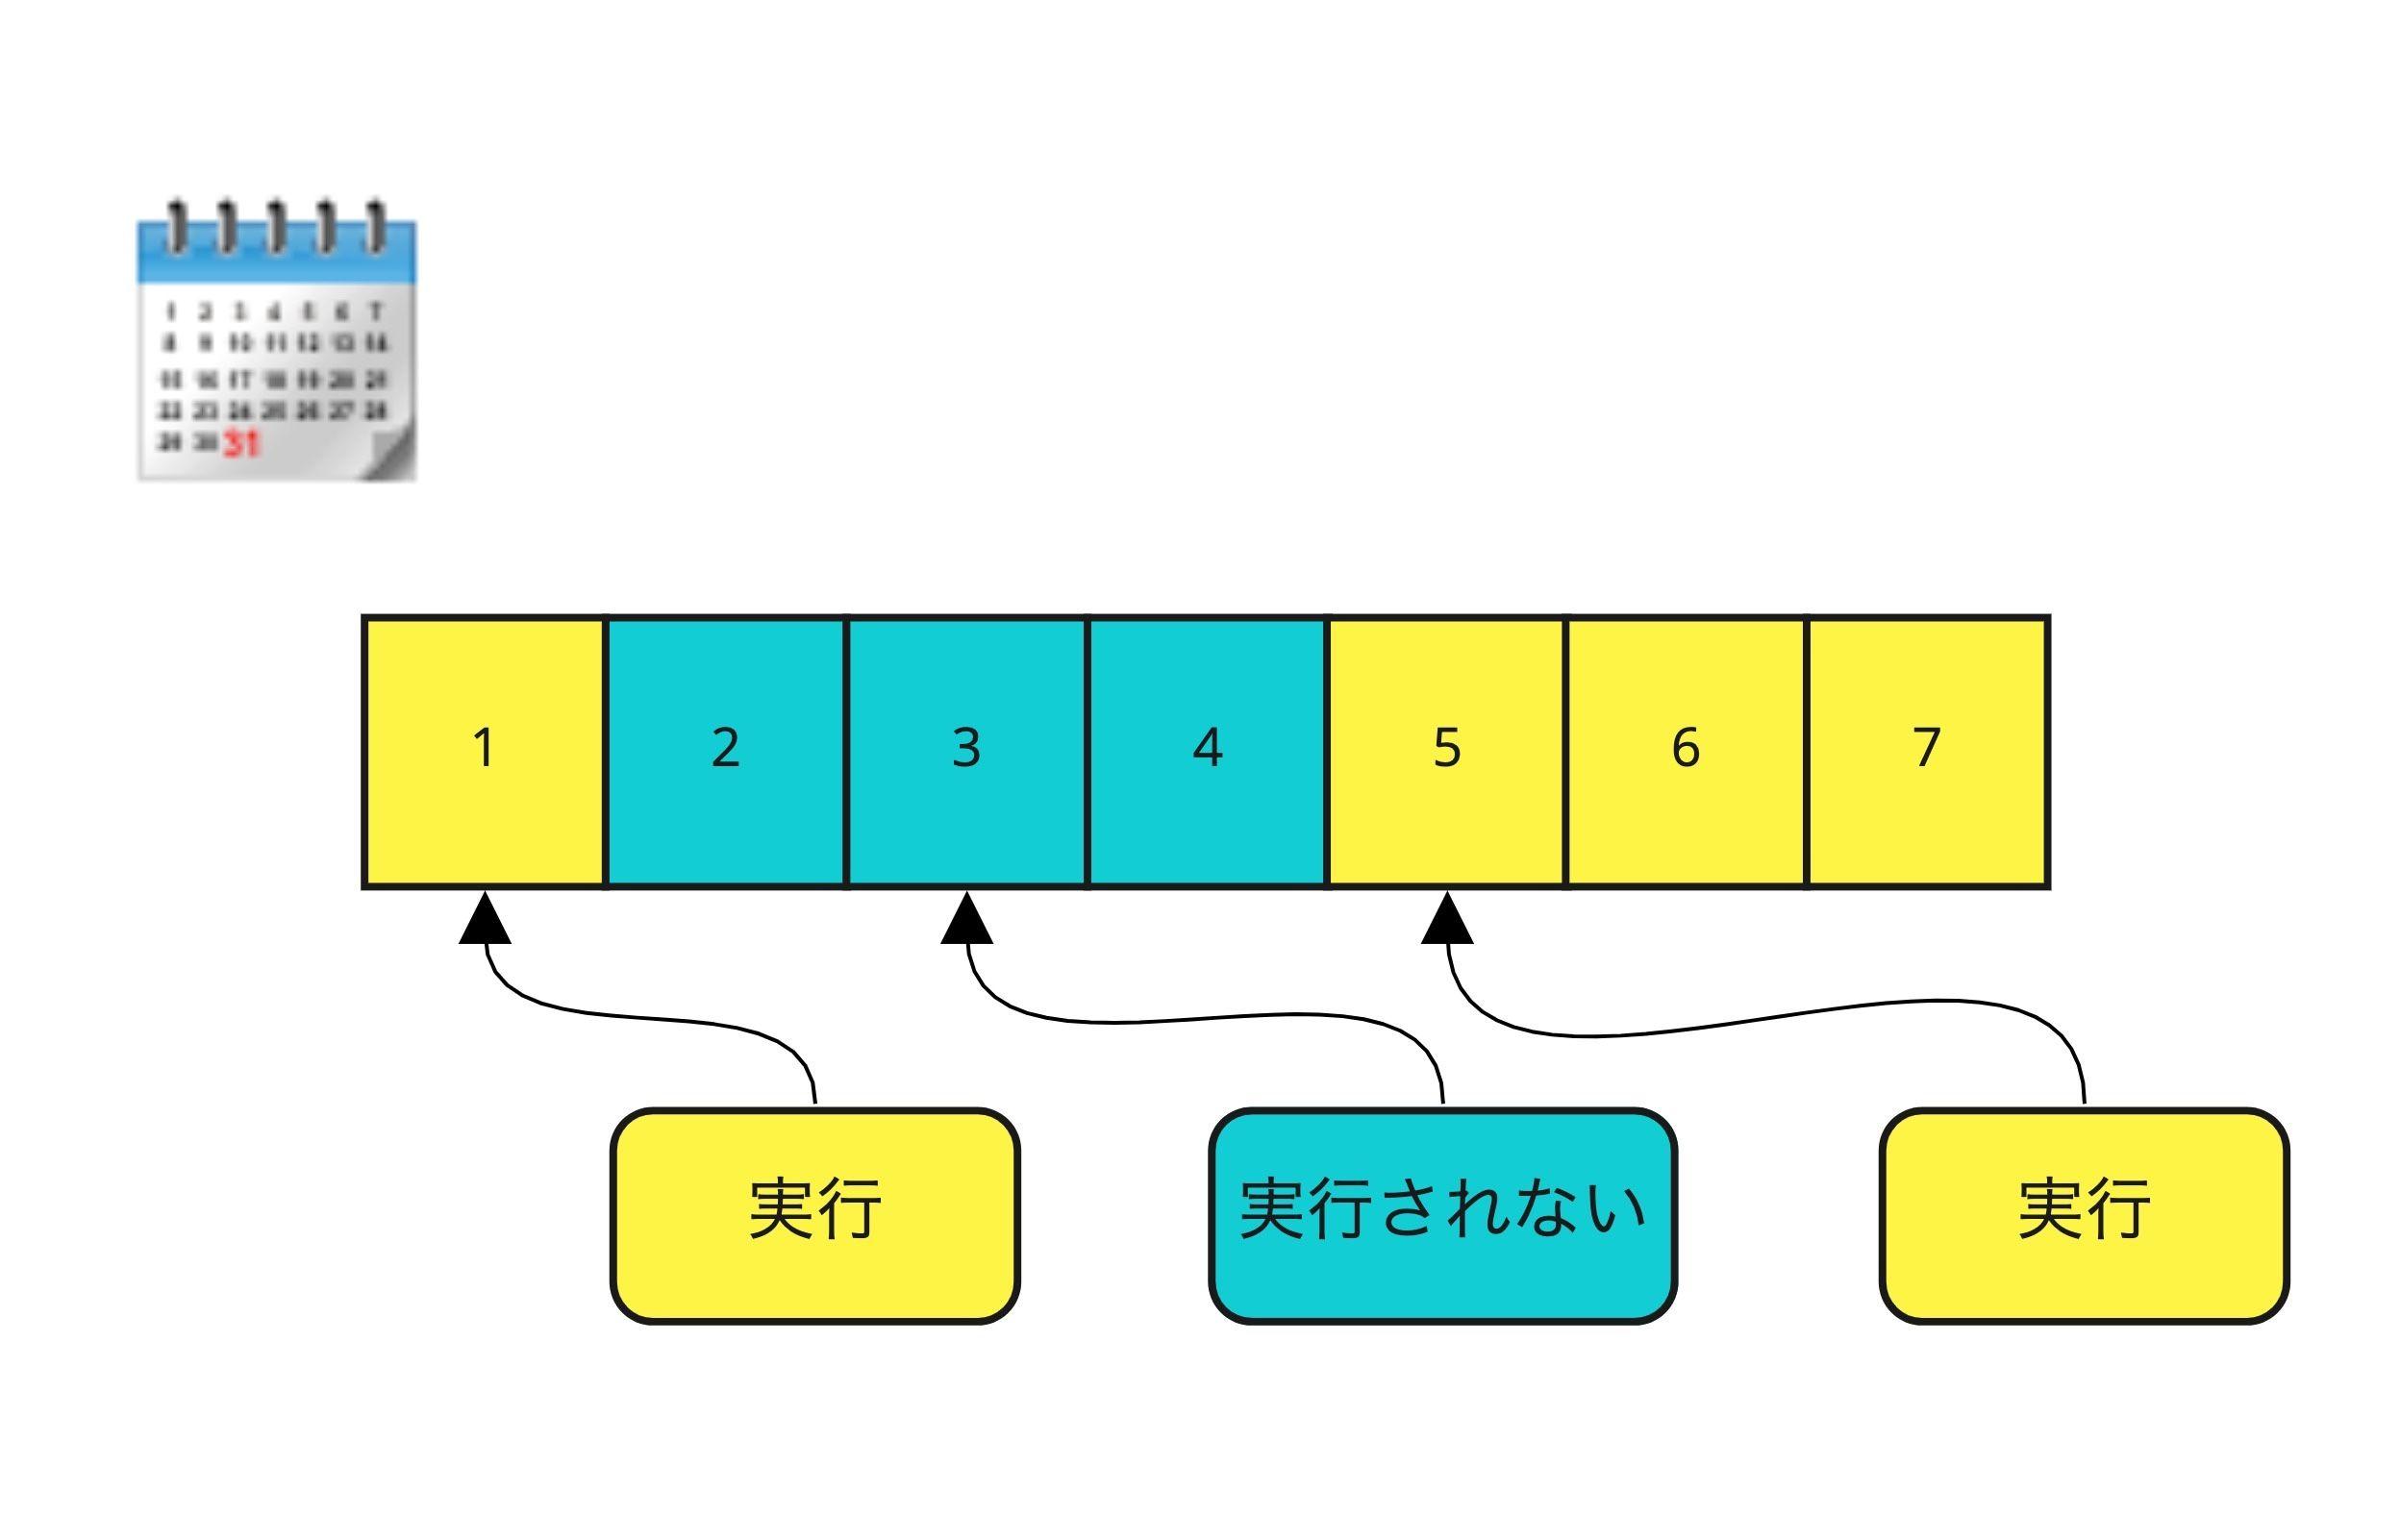 「Carbon Copy Cloner」の自動実行スキップのイメージ